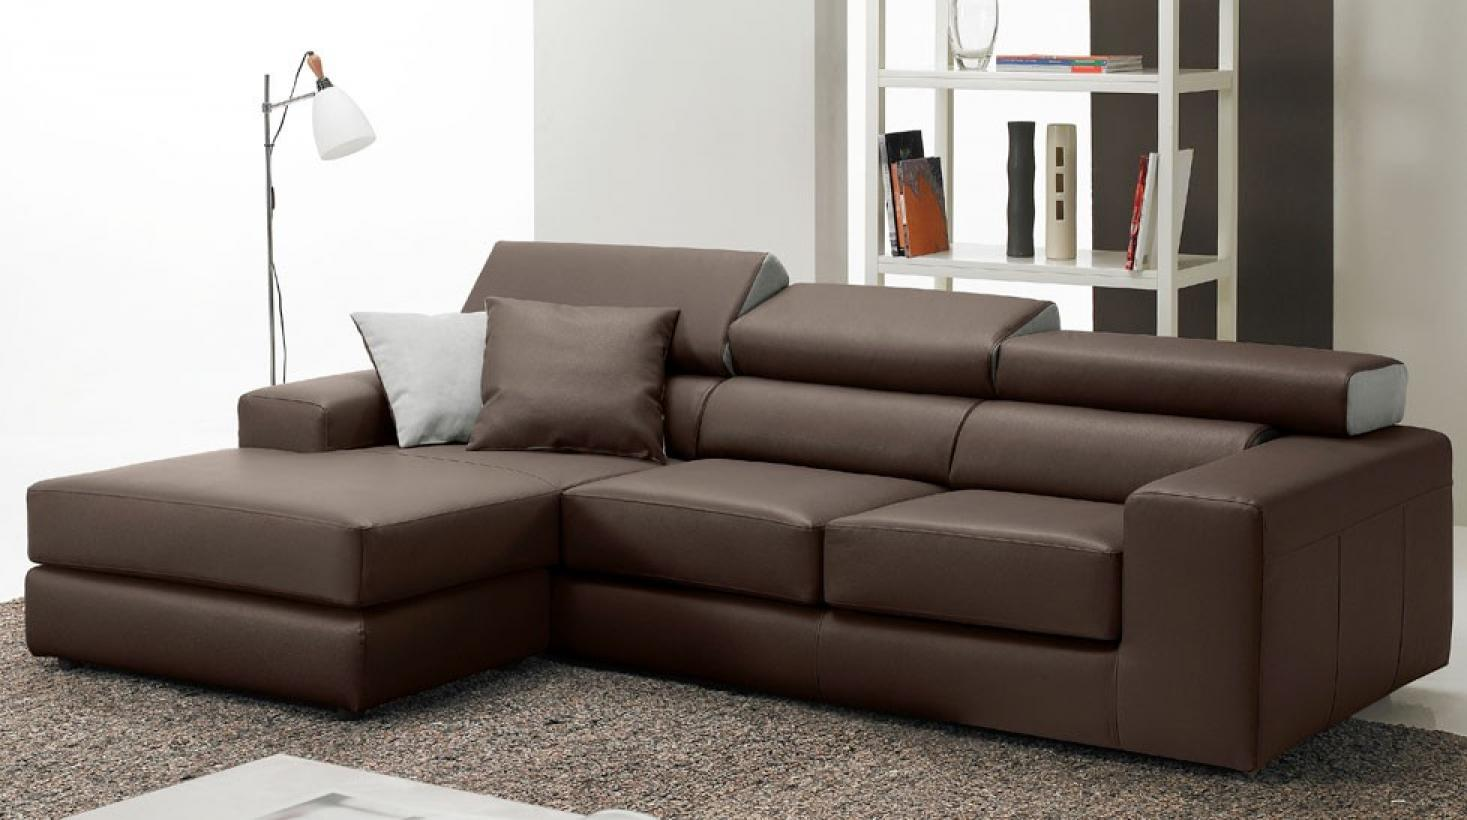 photos canap d 39 angle cuir marron pas cher. Black Bedroom Furniture Sets. Home Design Ideas